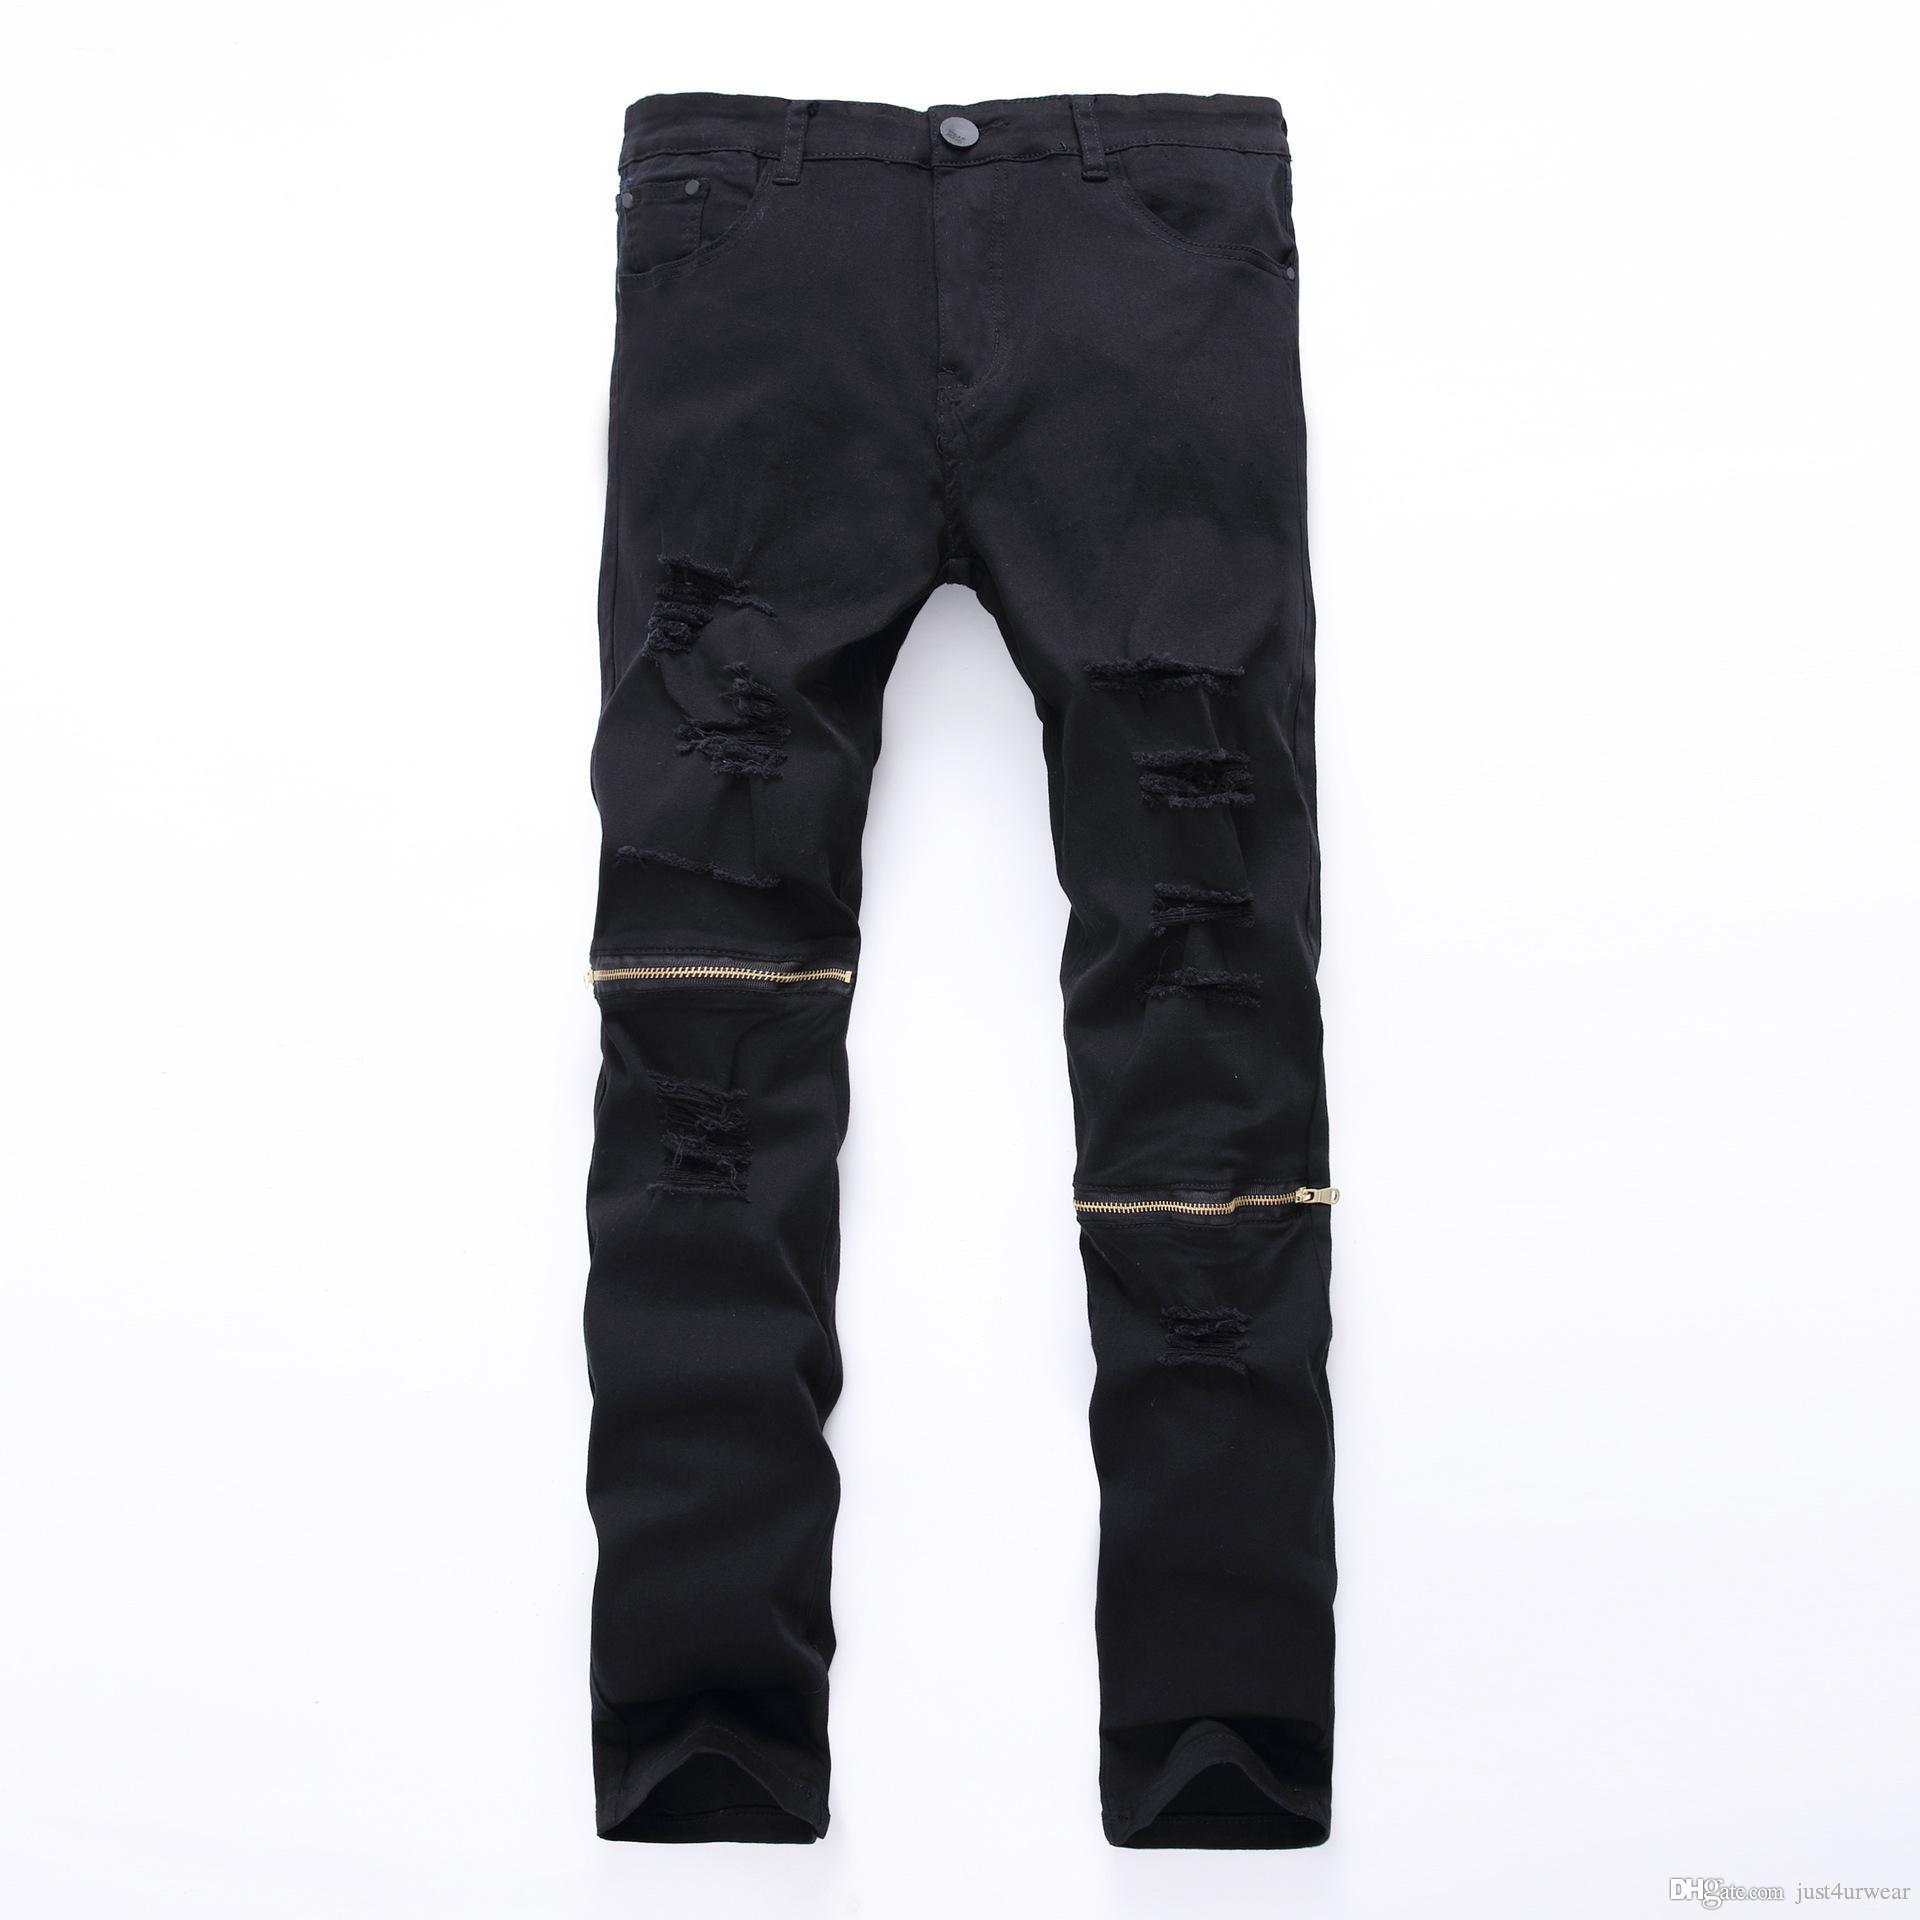 Mens nueva moda sólido Slim Jeans cremallera agujero calle blanco negro Ripped Jeans Hip Hop hombre Skateboard lápiz Pantalones